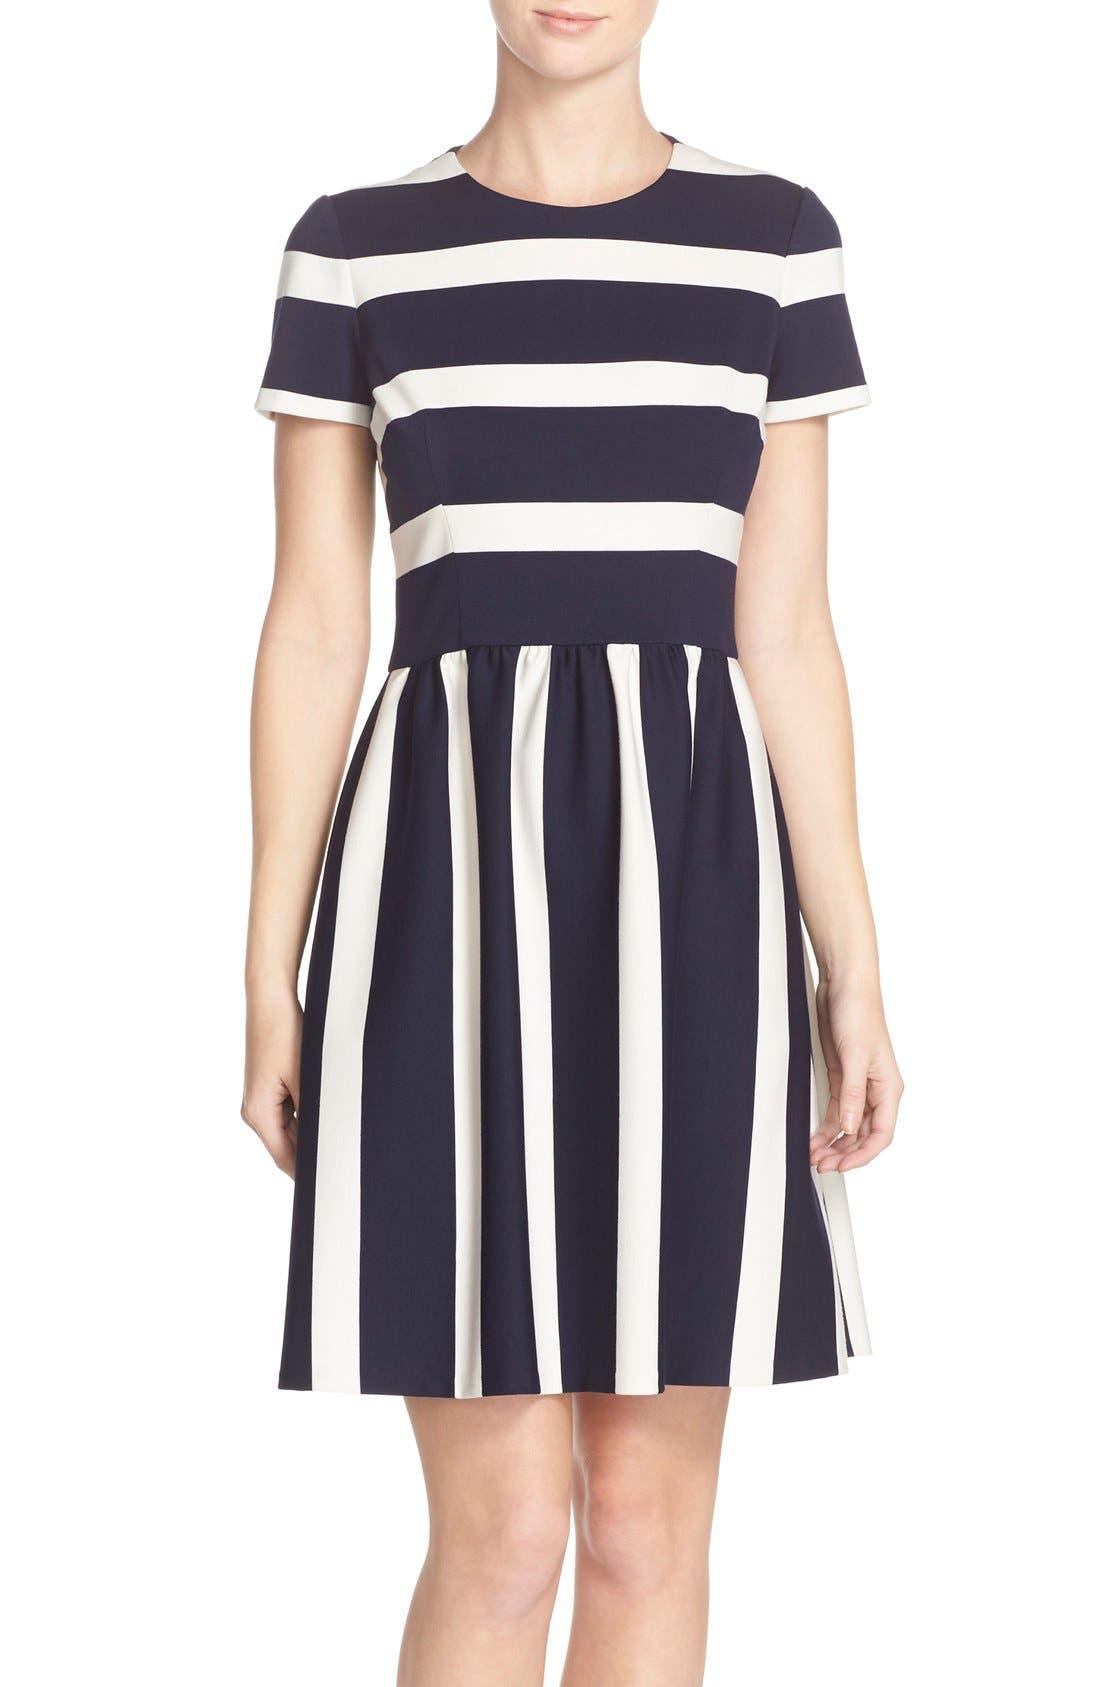 Main Image - Eliza J Stripe Knit Fit & Flare Dress (Regular & Petite)